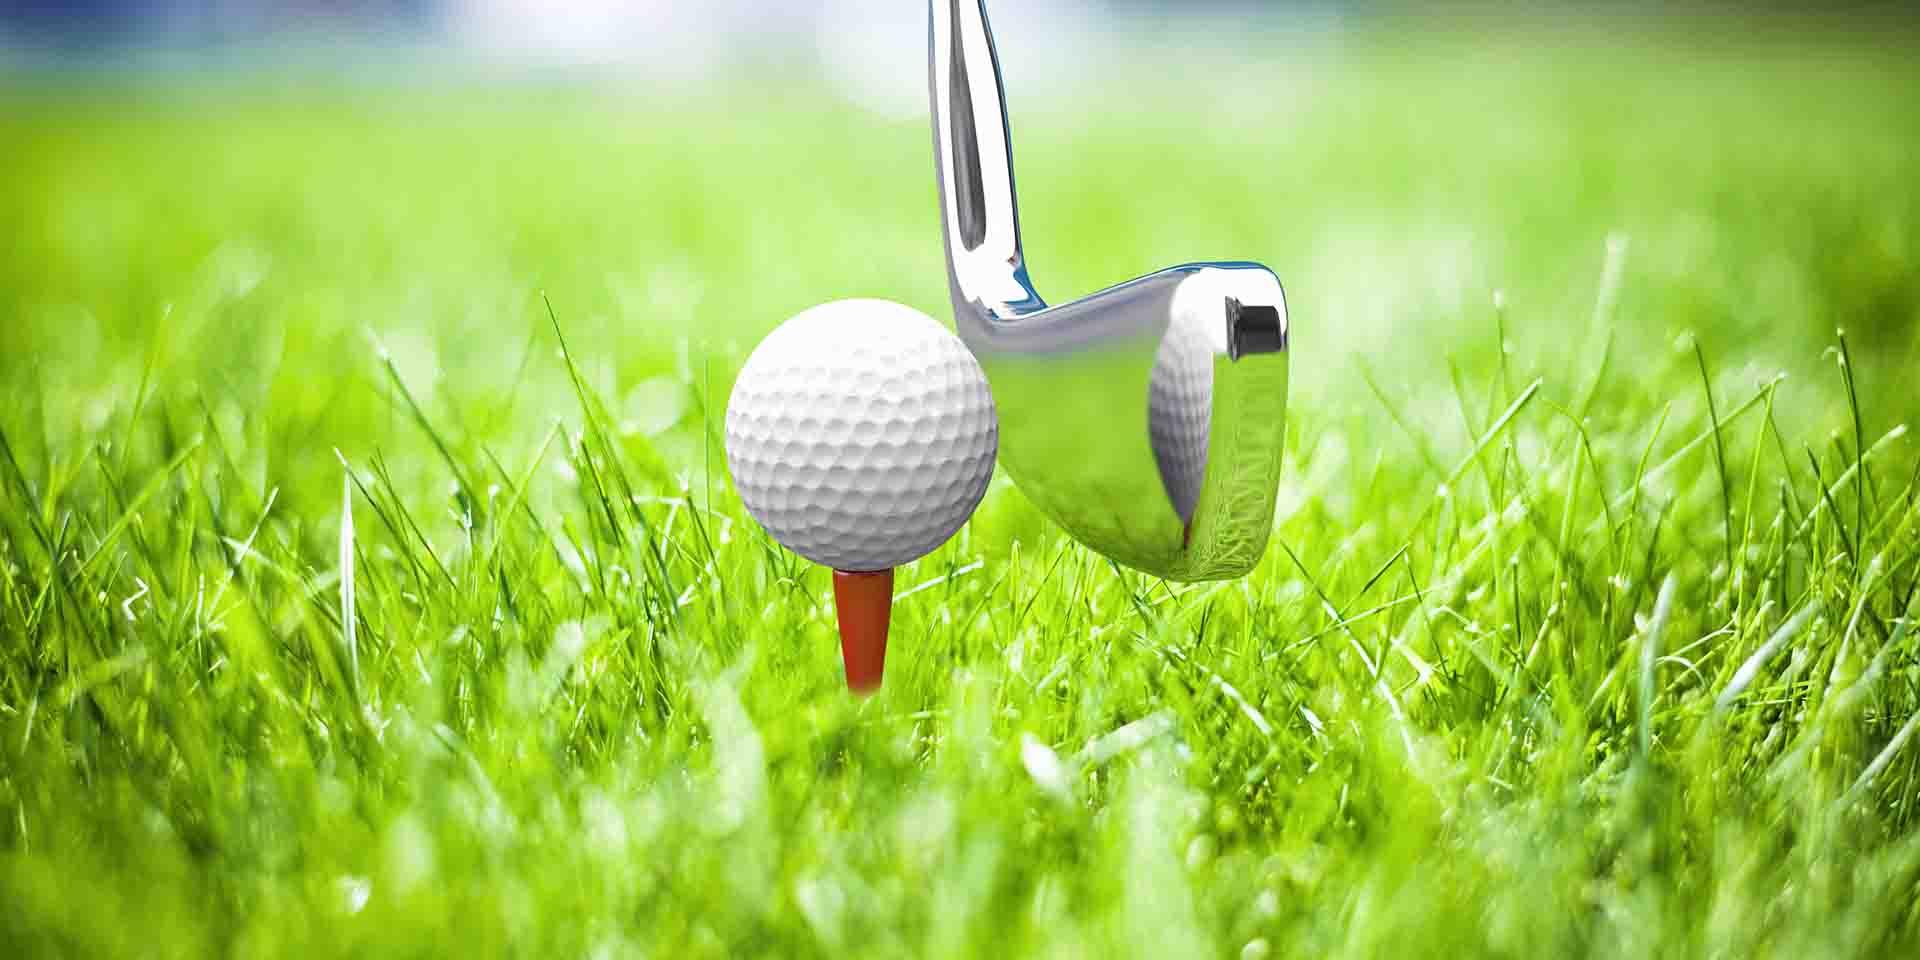 Golf ball and putter.